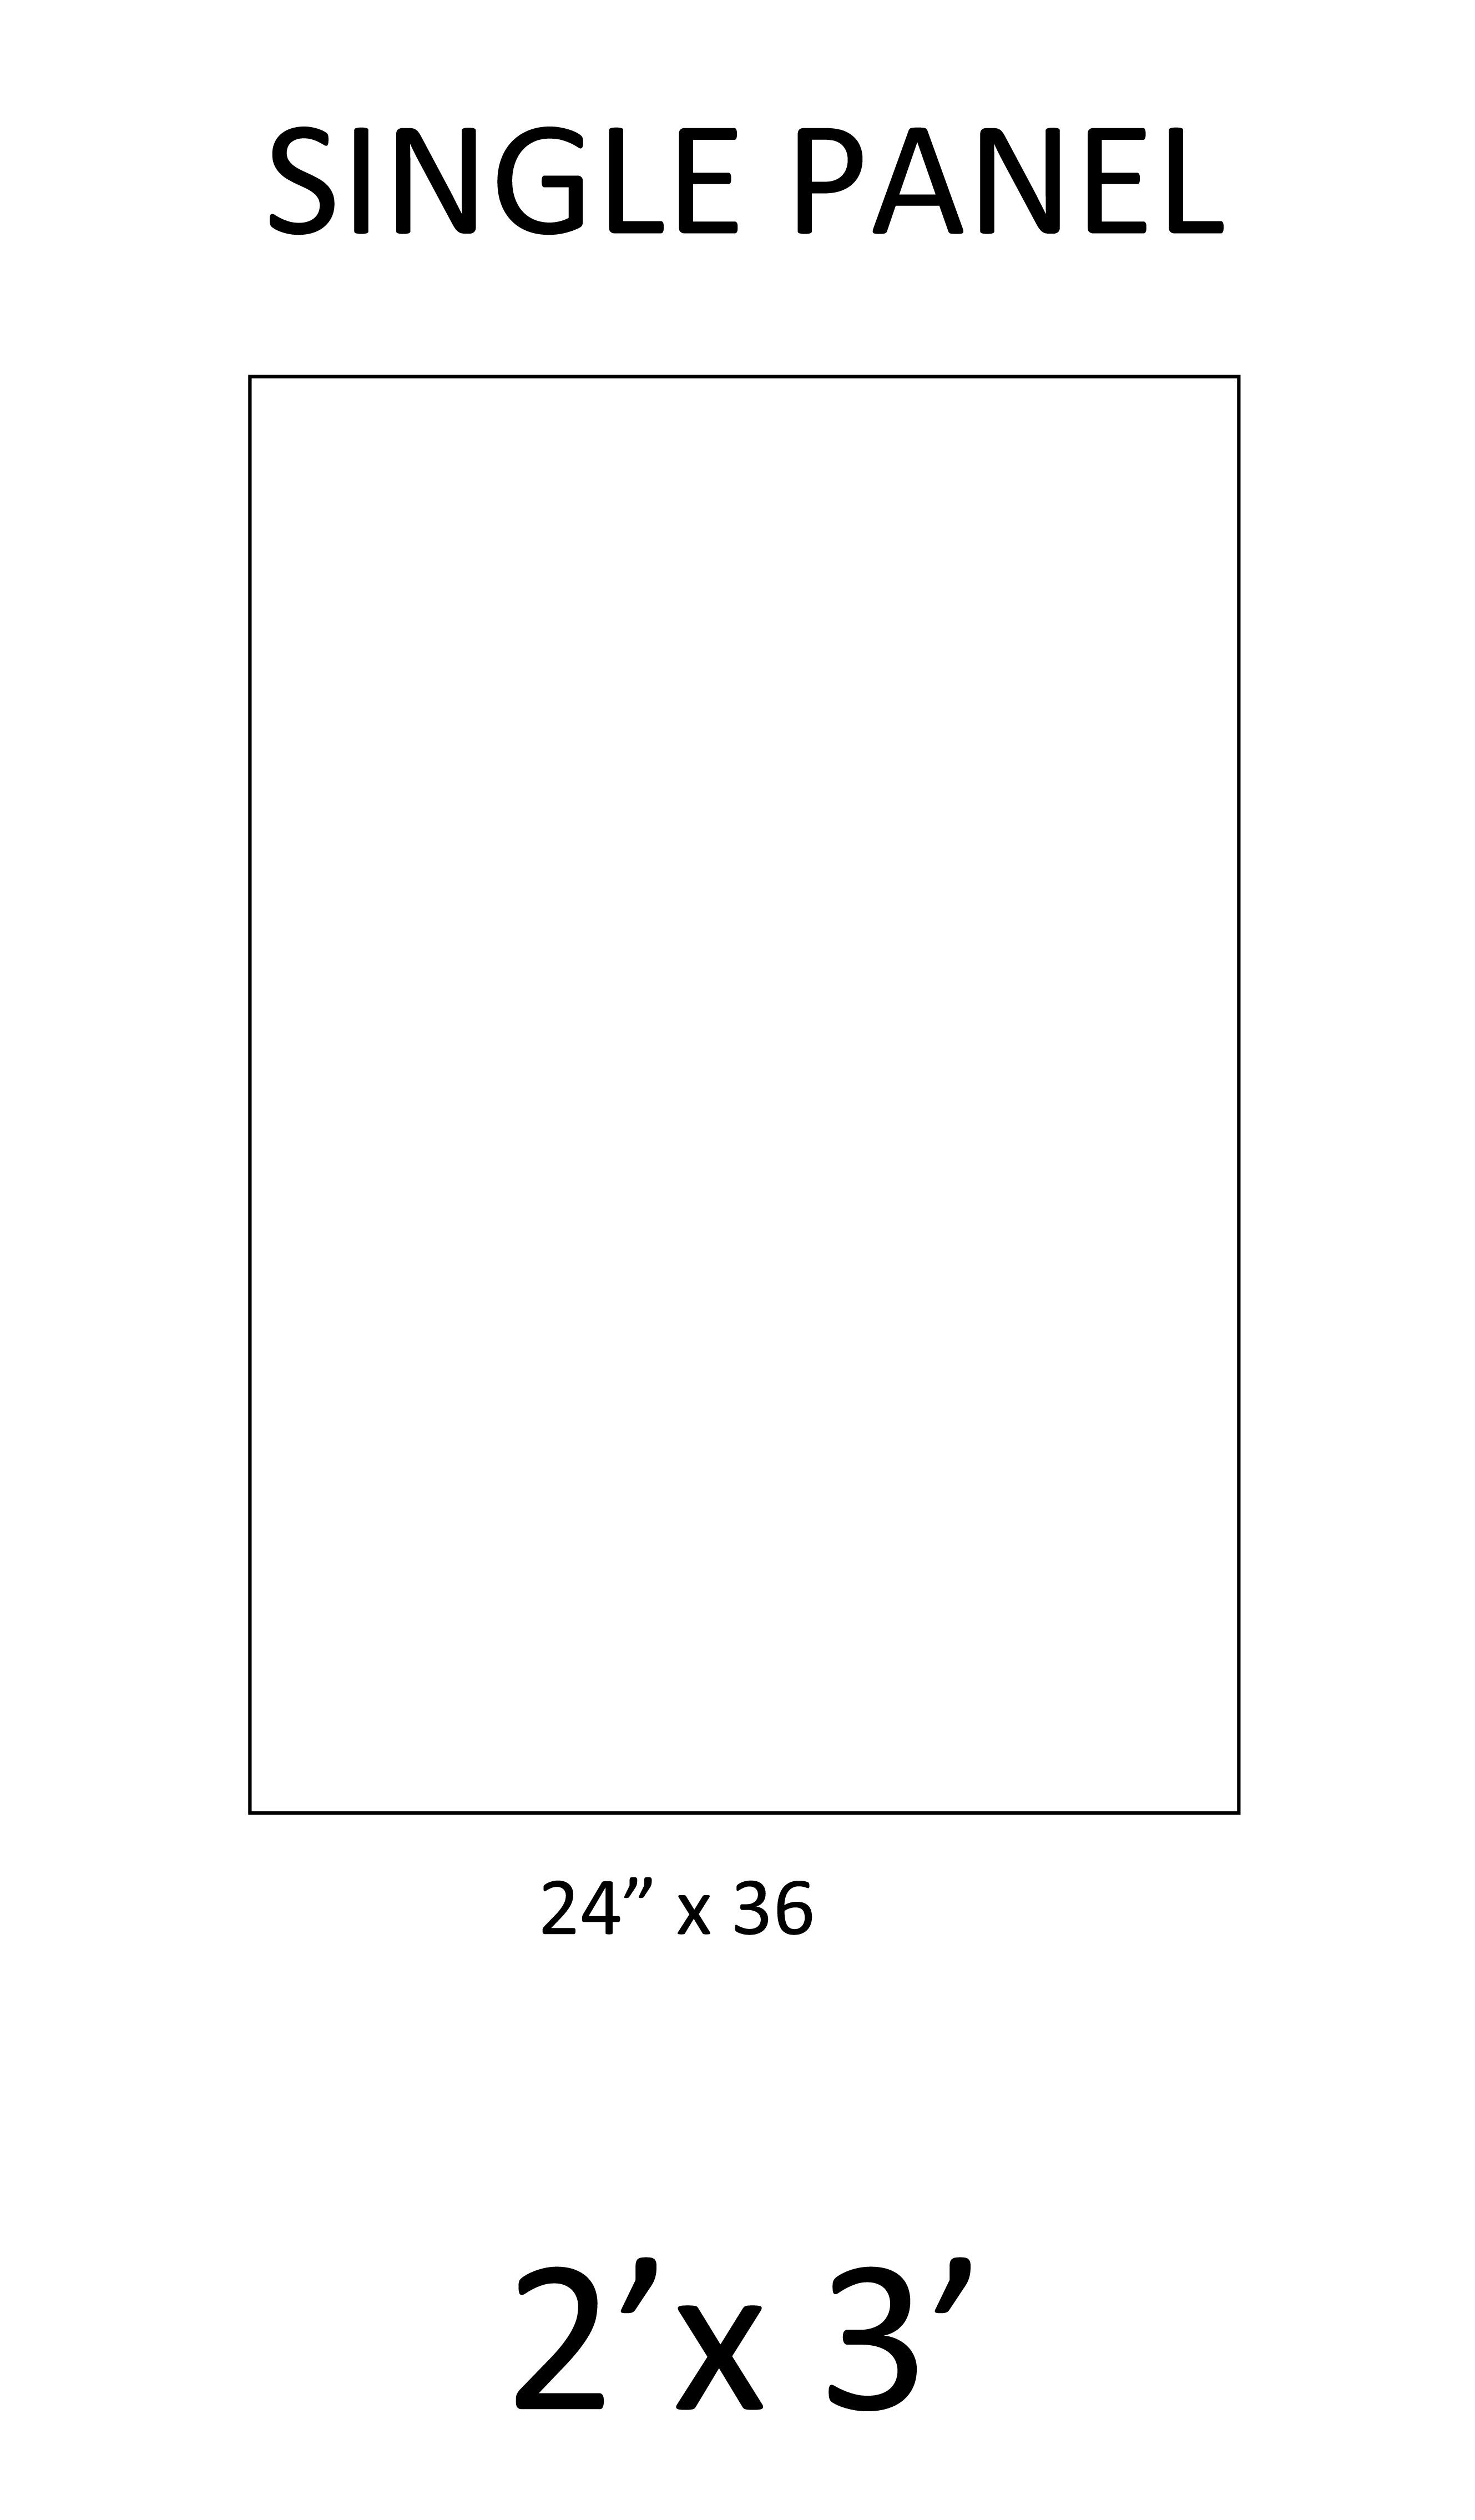 1 - Single Panel